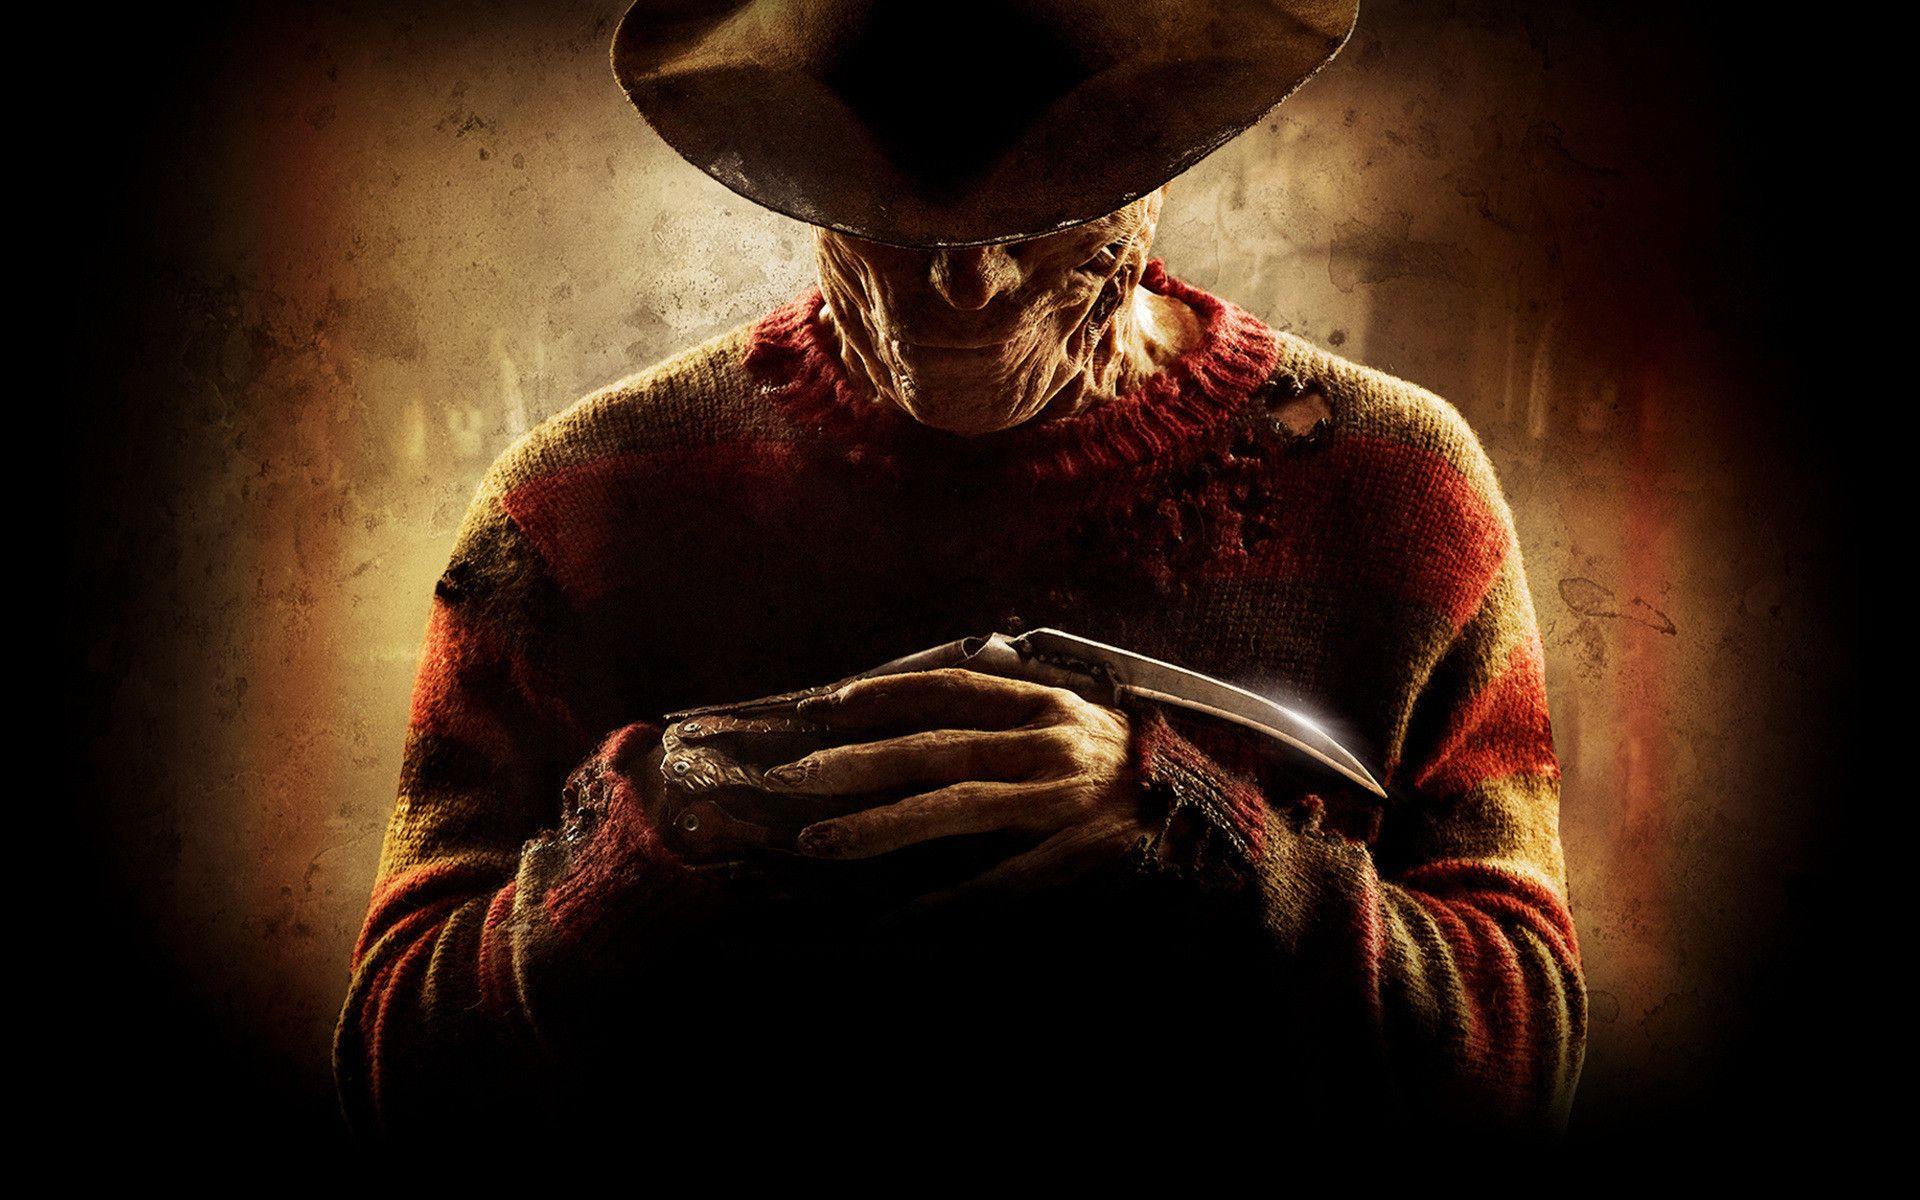 13 filmes de terror na Netflix para assistir nesta sexta-feira 13